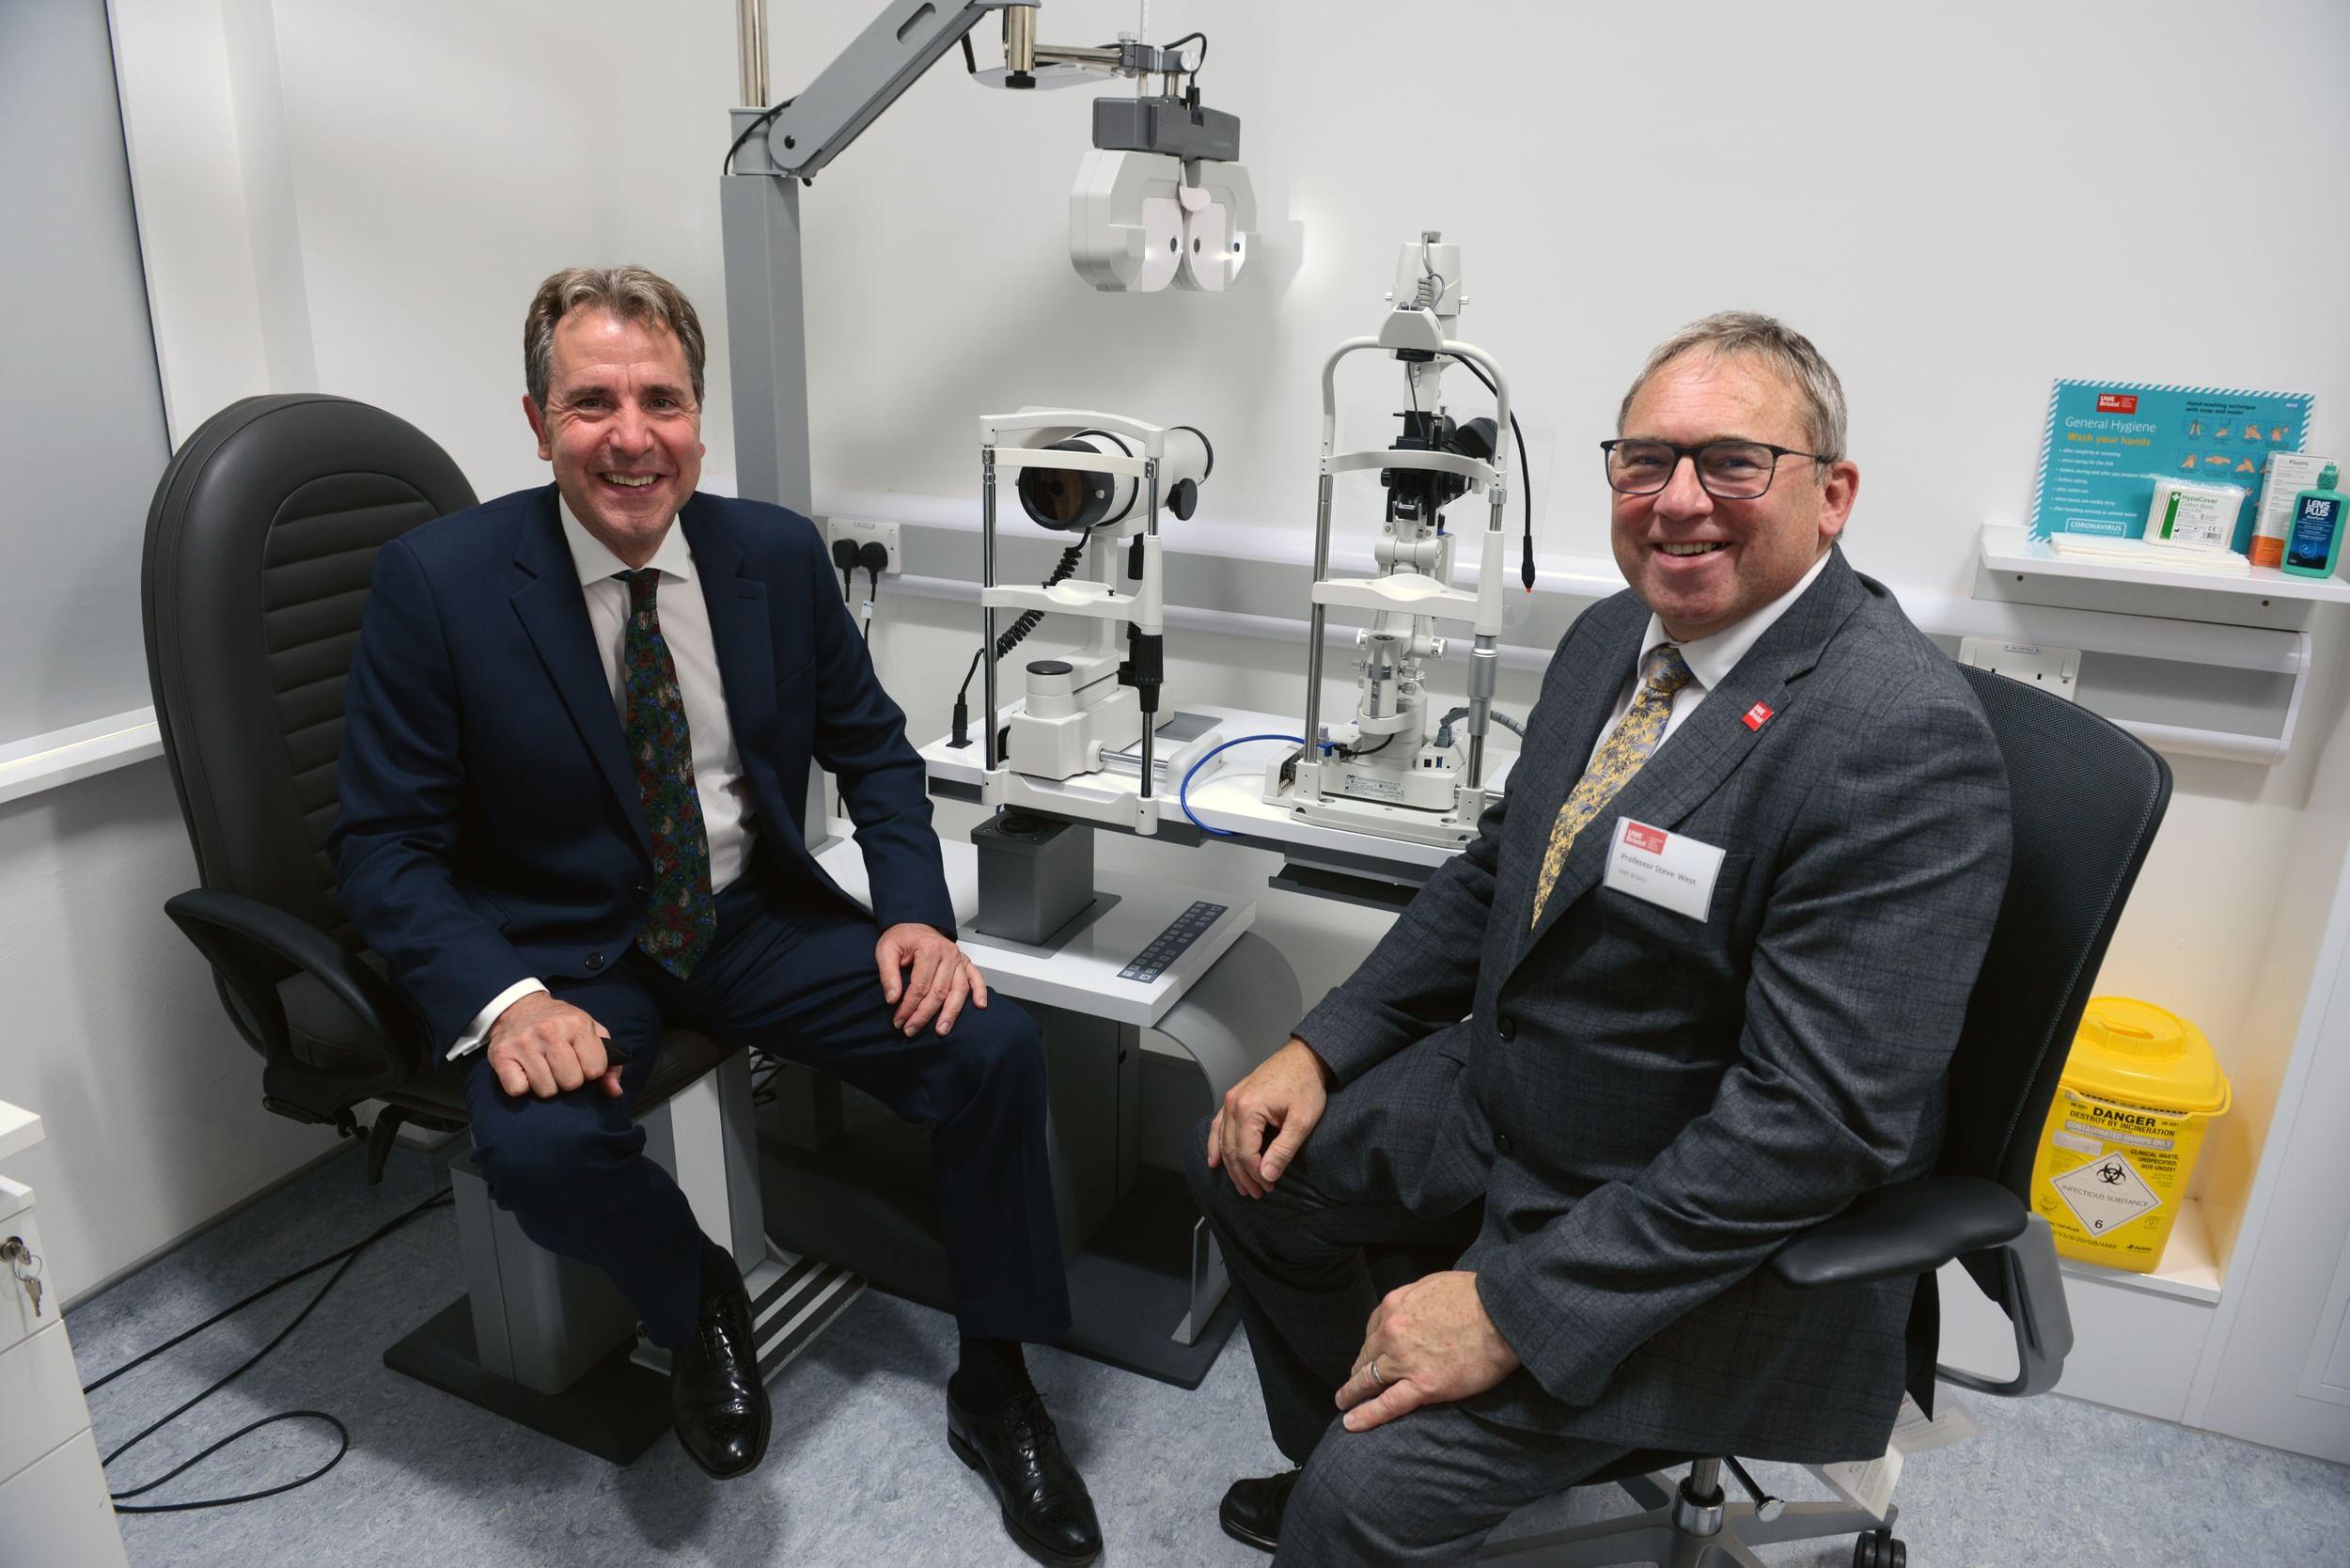 Dan Norris visits UWE Eye Clinic